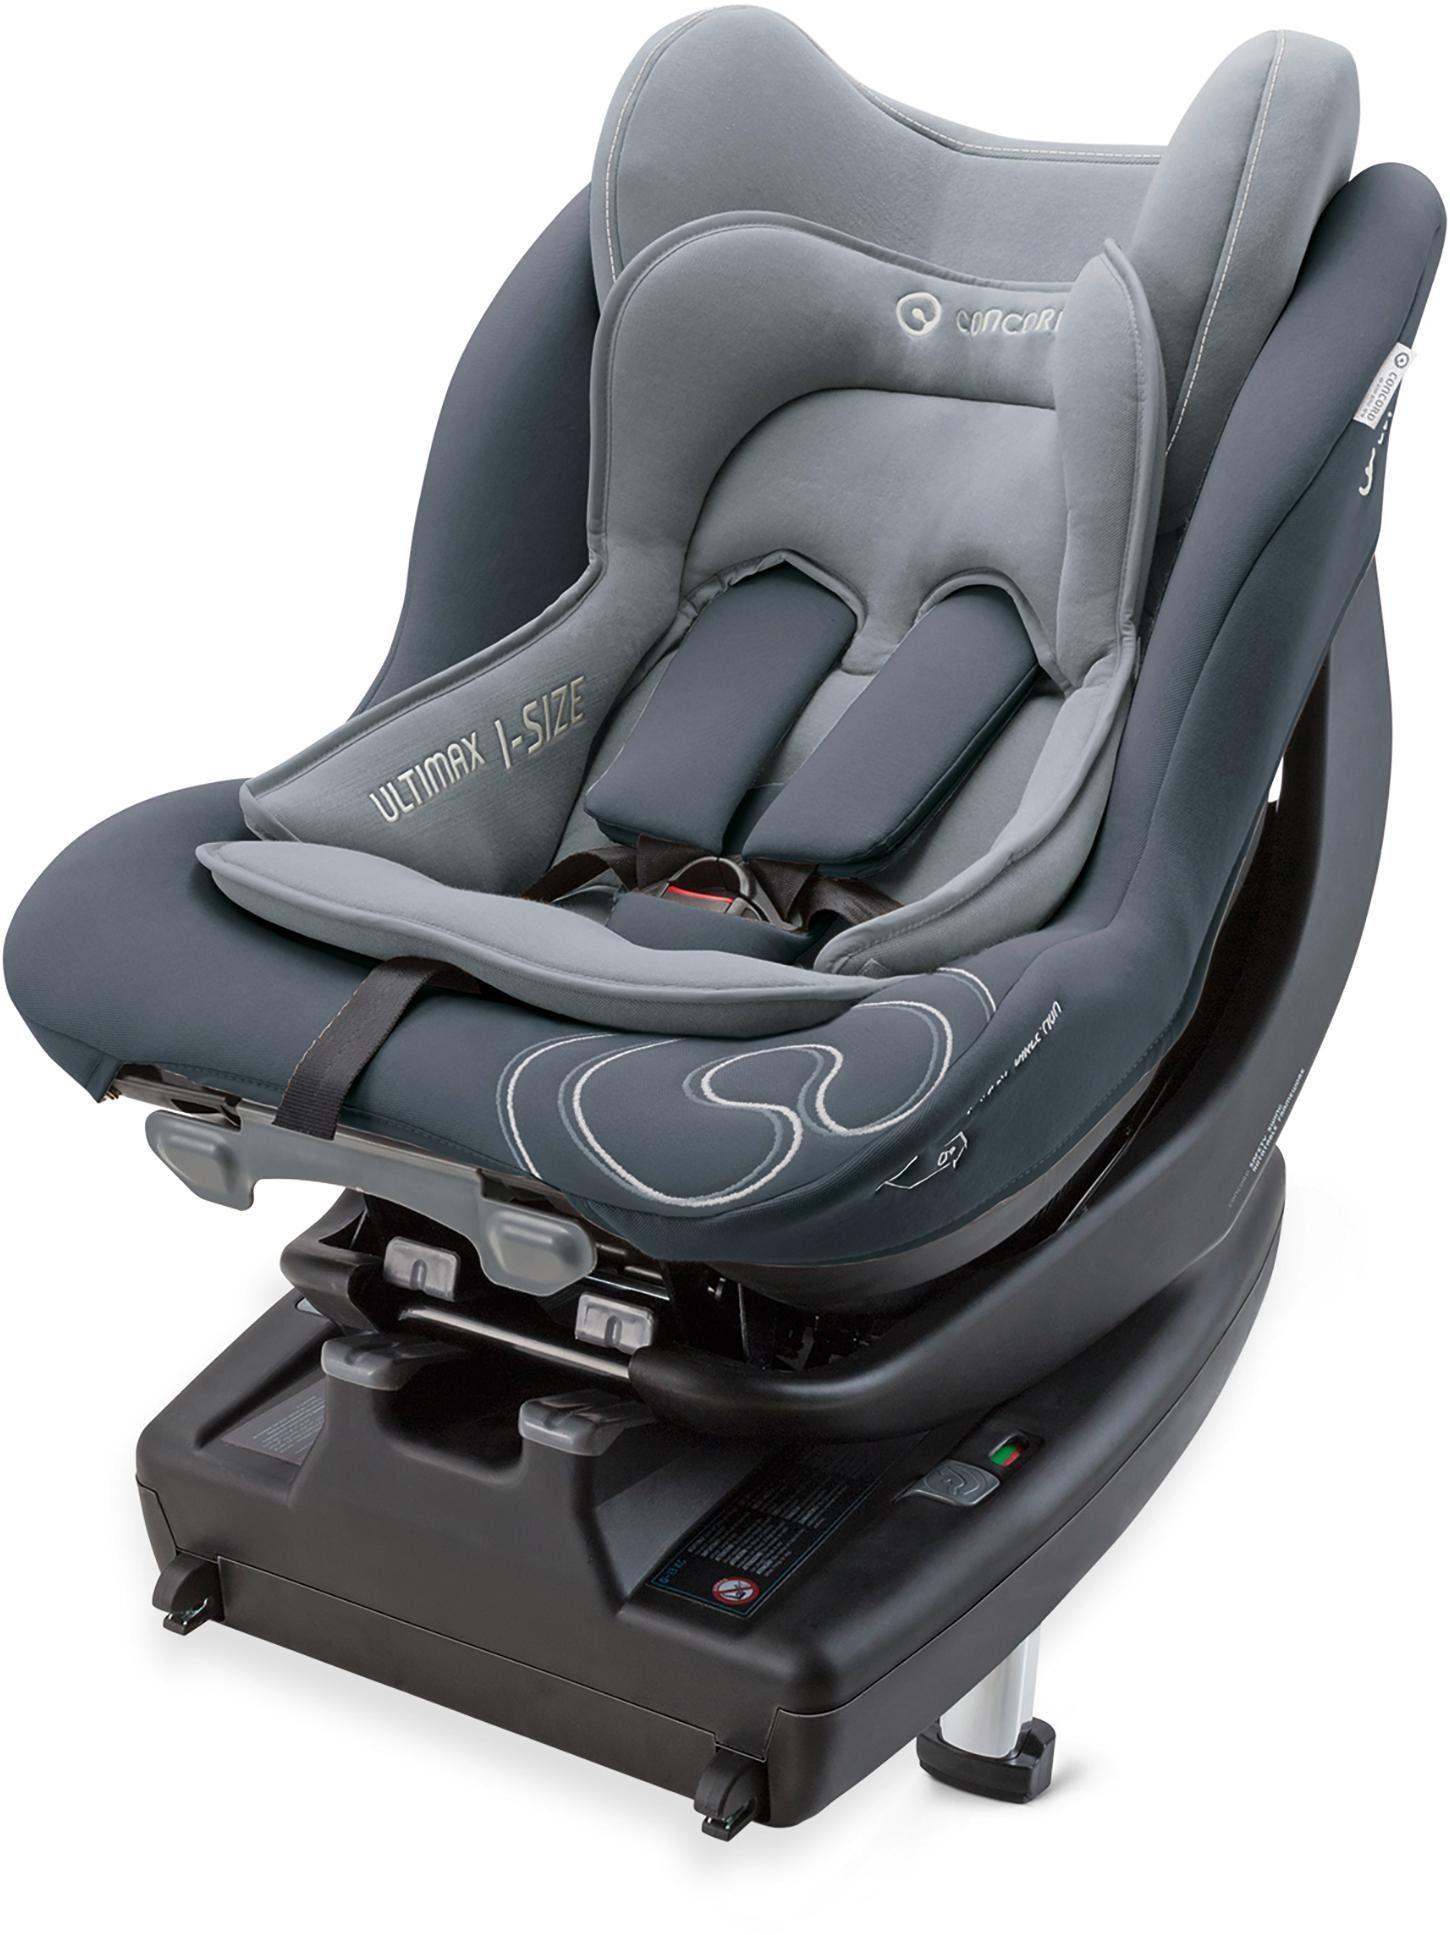 Concord Kindersitz, 0-18 kg, »Ultimax I-Size, Steel Grey«